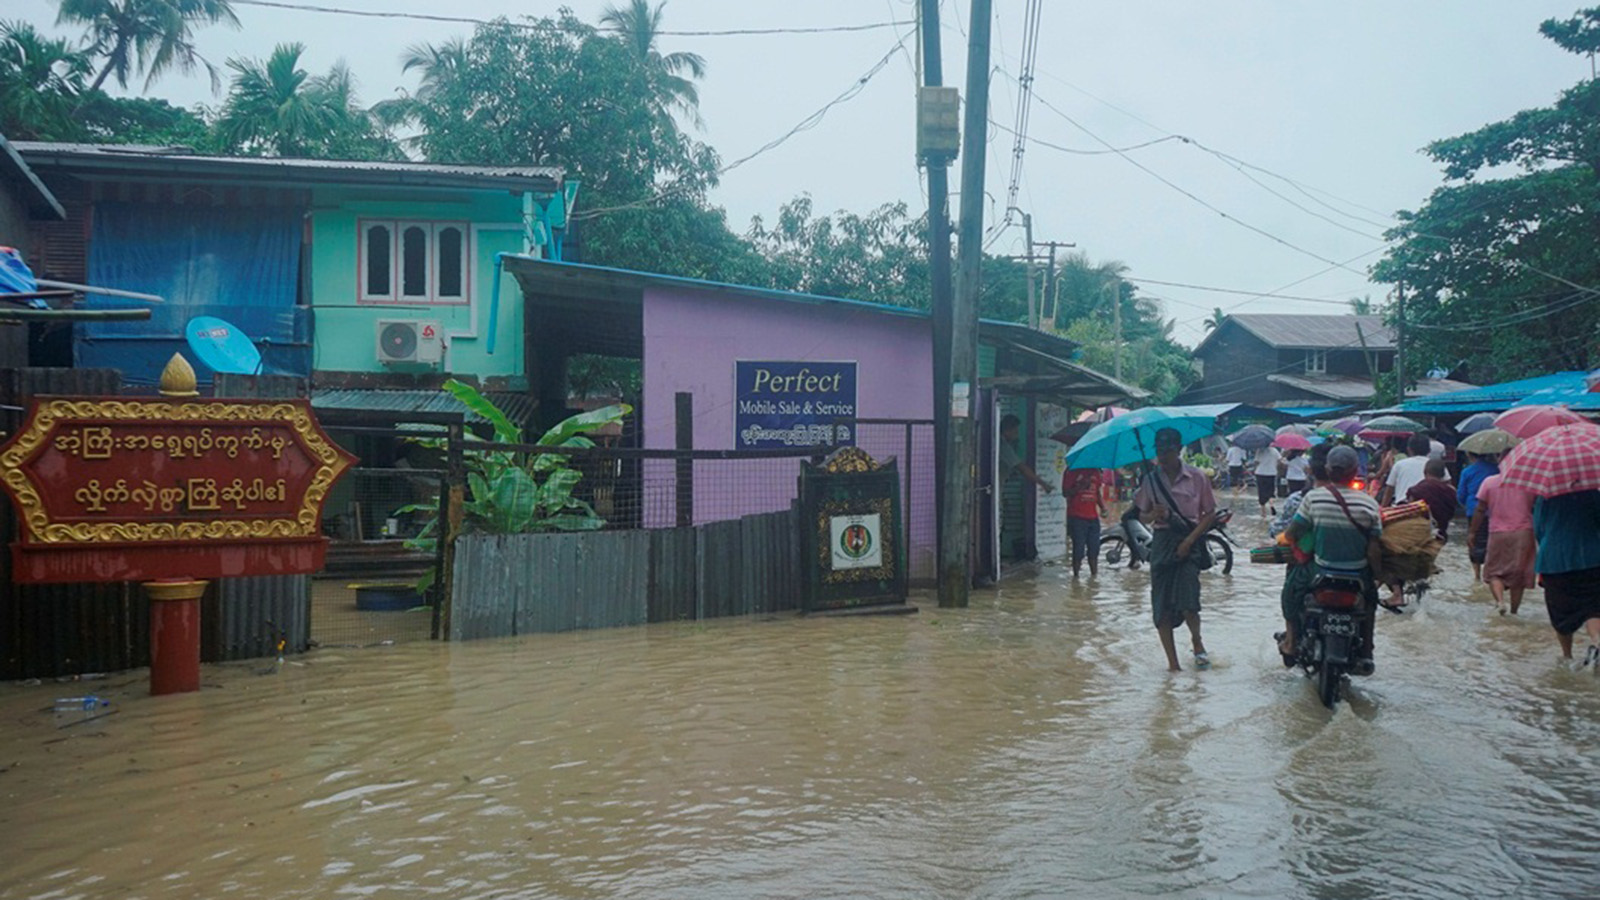 High tide floods one of the streets at Arntgyi Ward in Dala yesterday.Photo: Naing Lin Kyaw